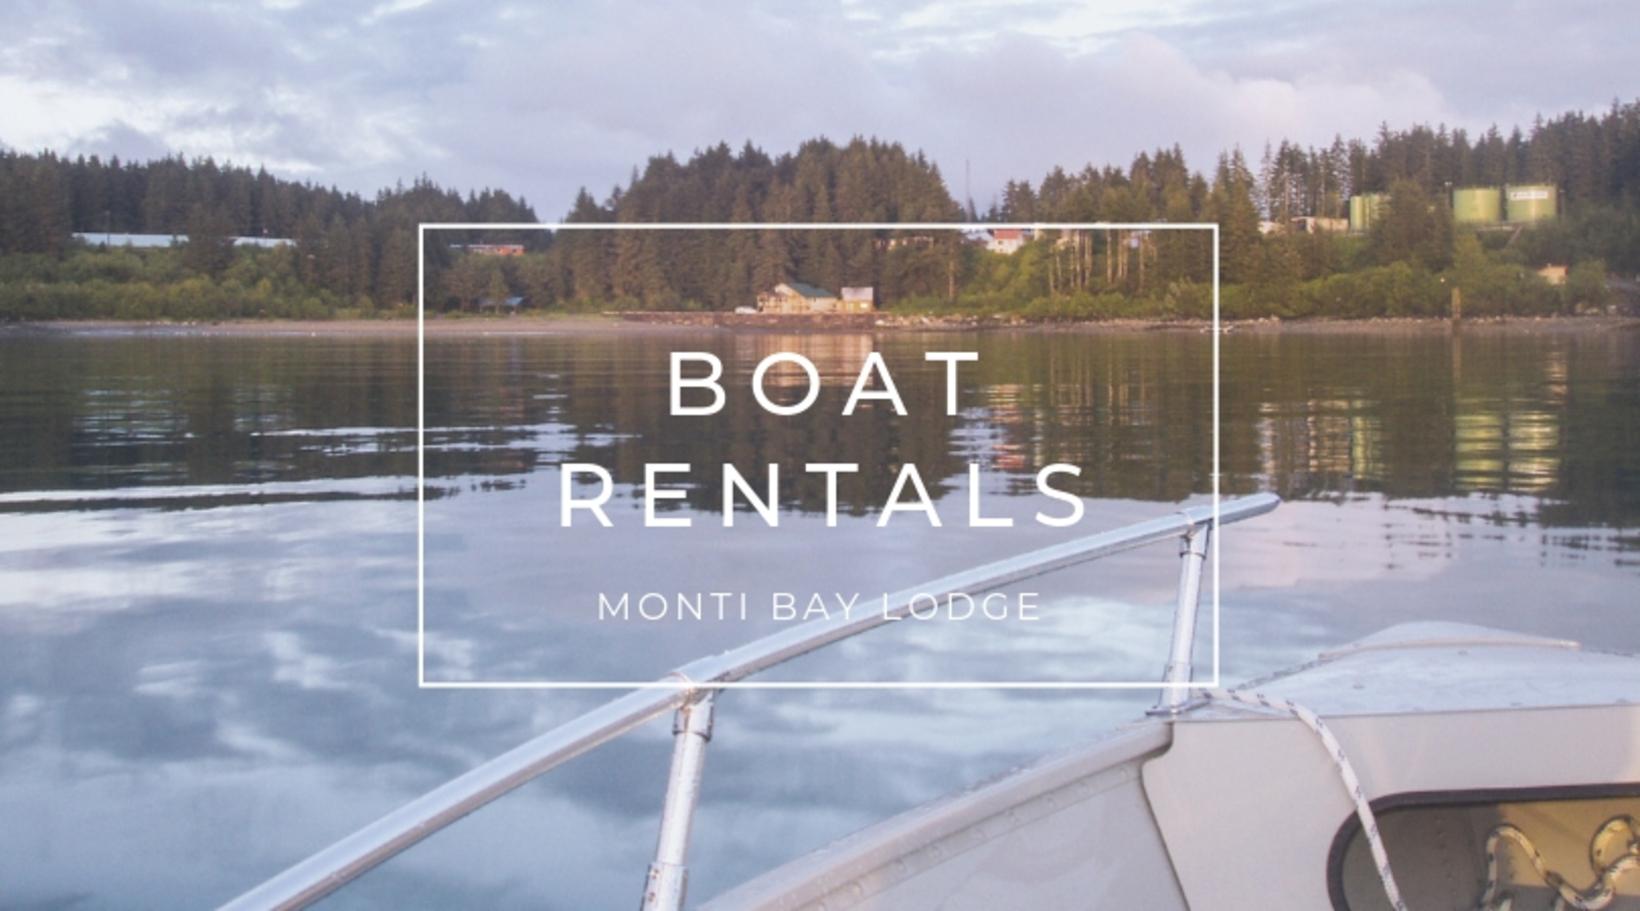 Boat Rental Options at Monti Bay Lodge